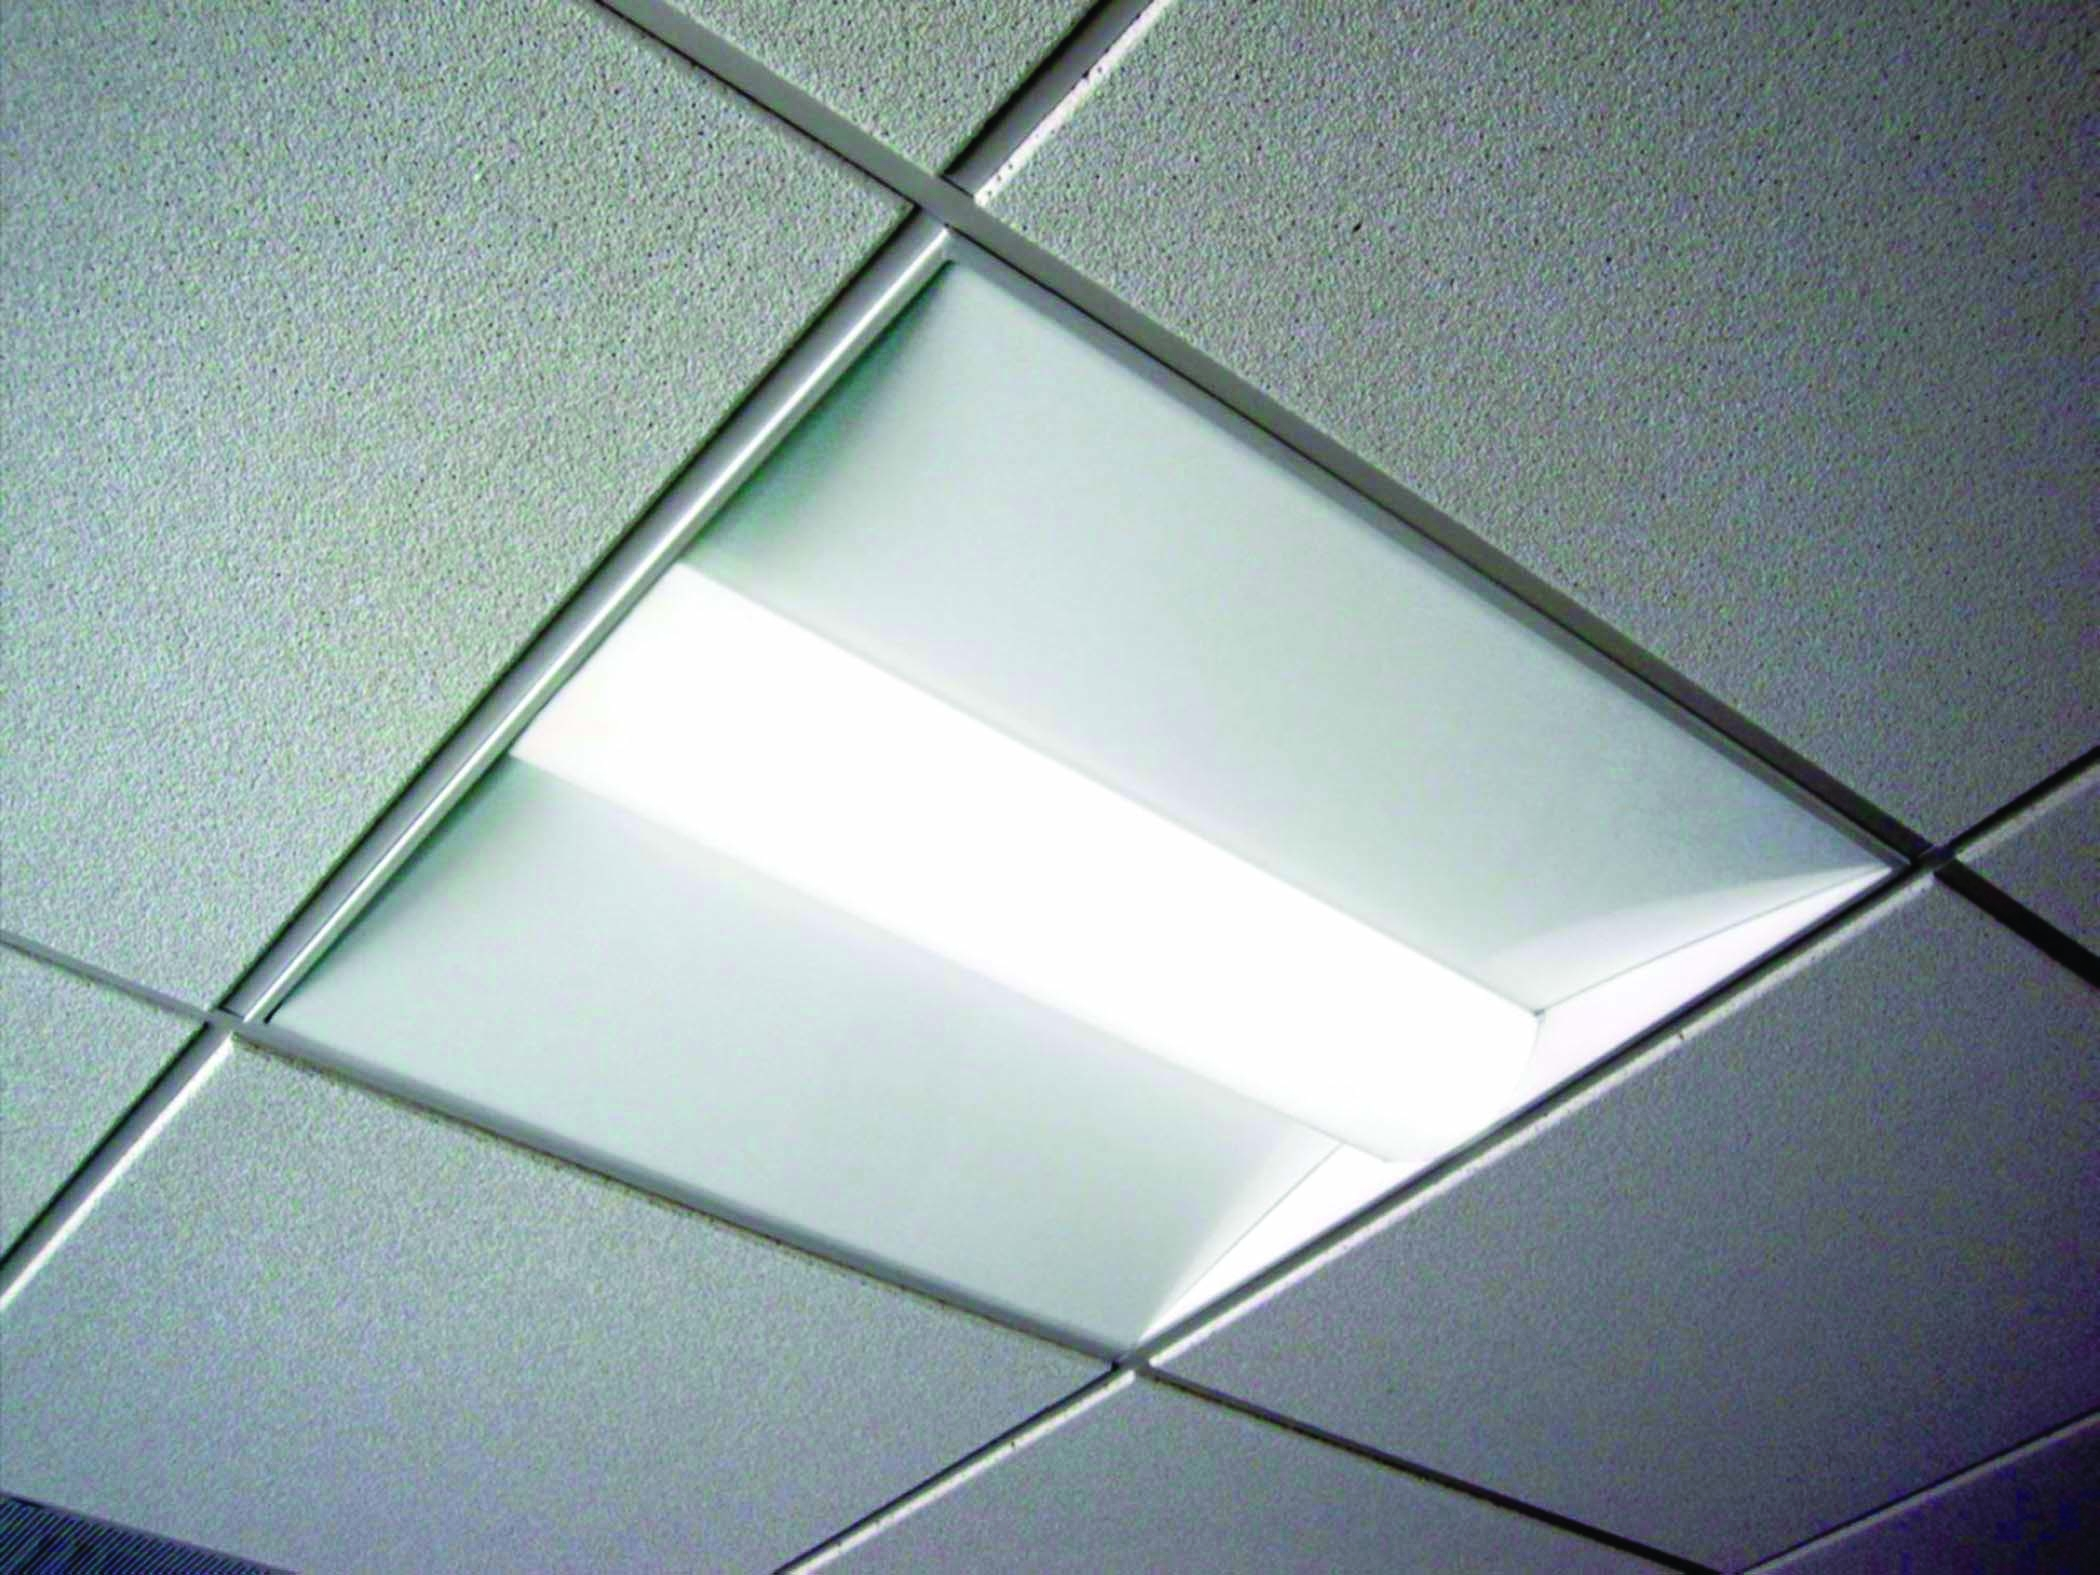 Lights For Drop Ceiling Tiles